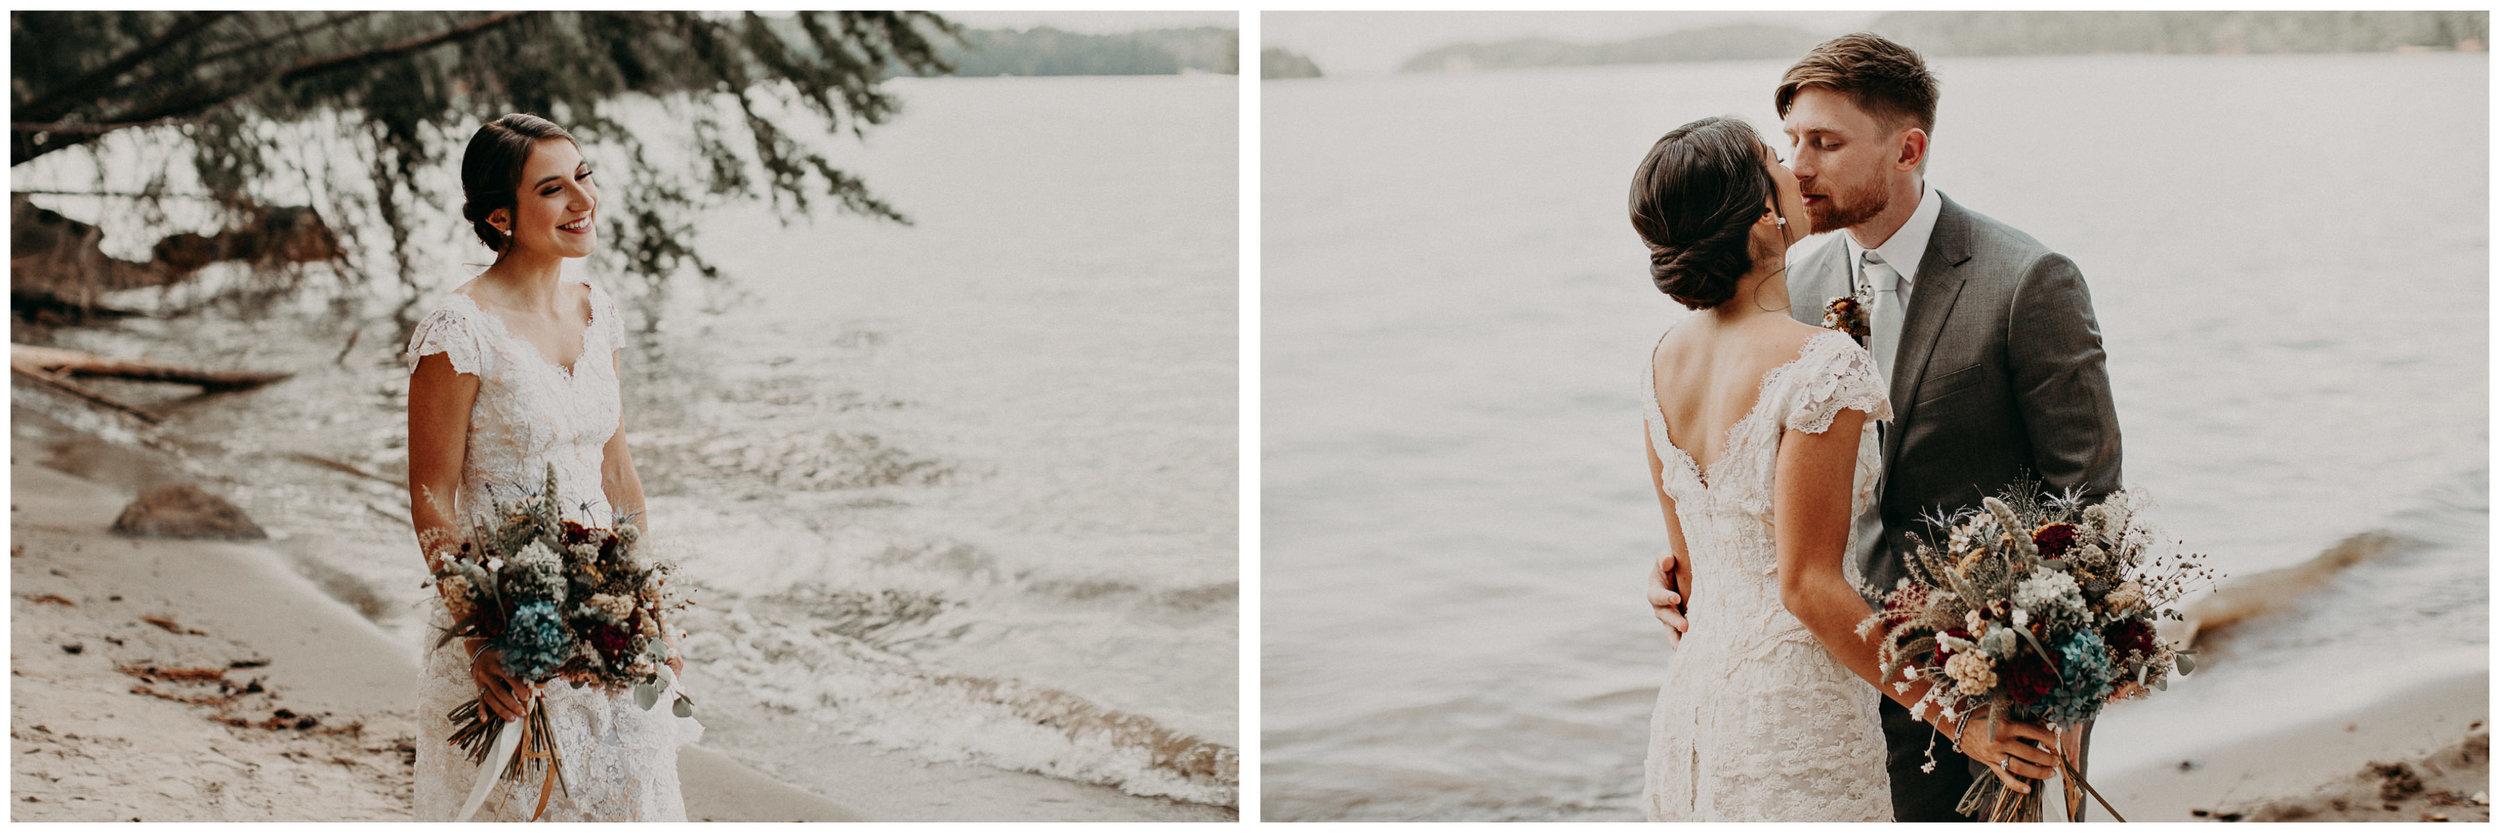 67  Bride & Groom Portraits before the ceremony on wedding day - Atlanta Wedding Photographer .jpg